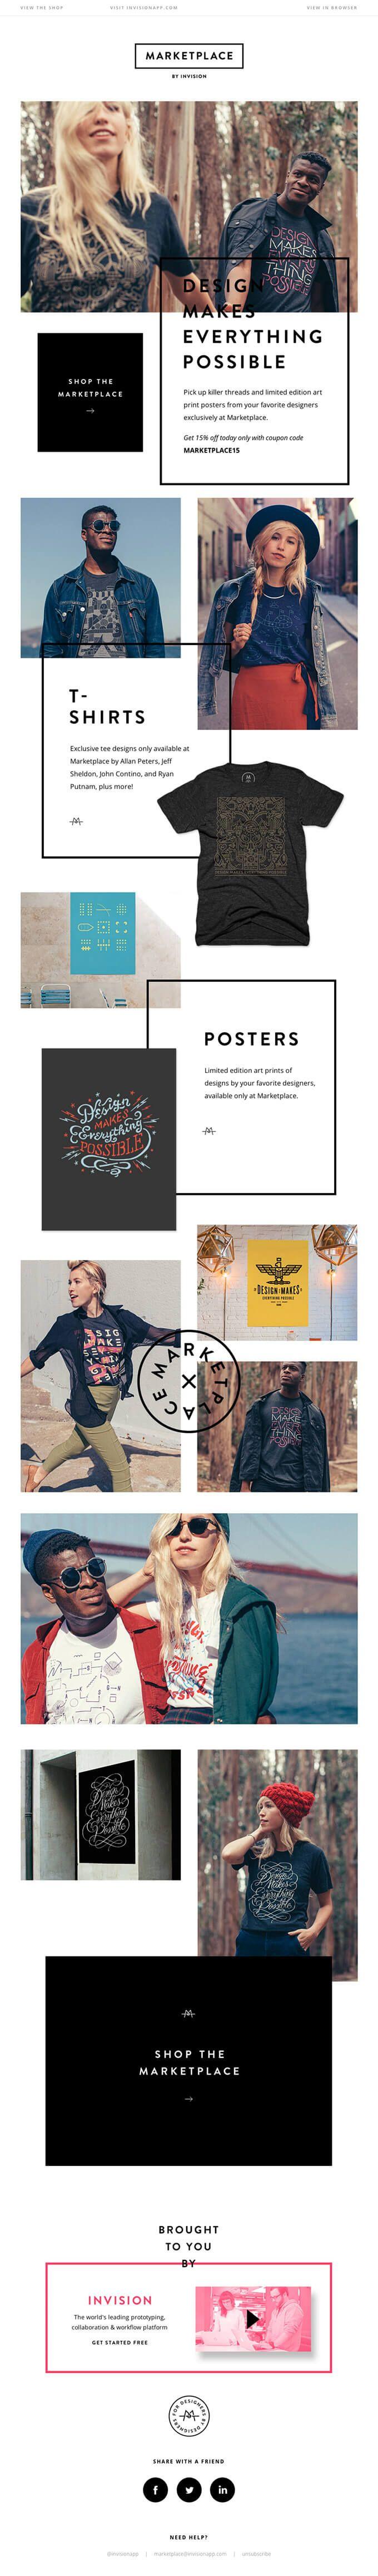 429 best Email Design images on Pinterest